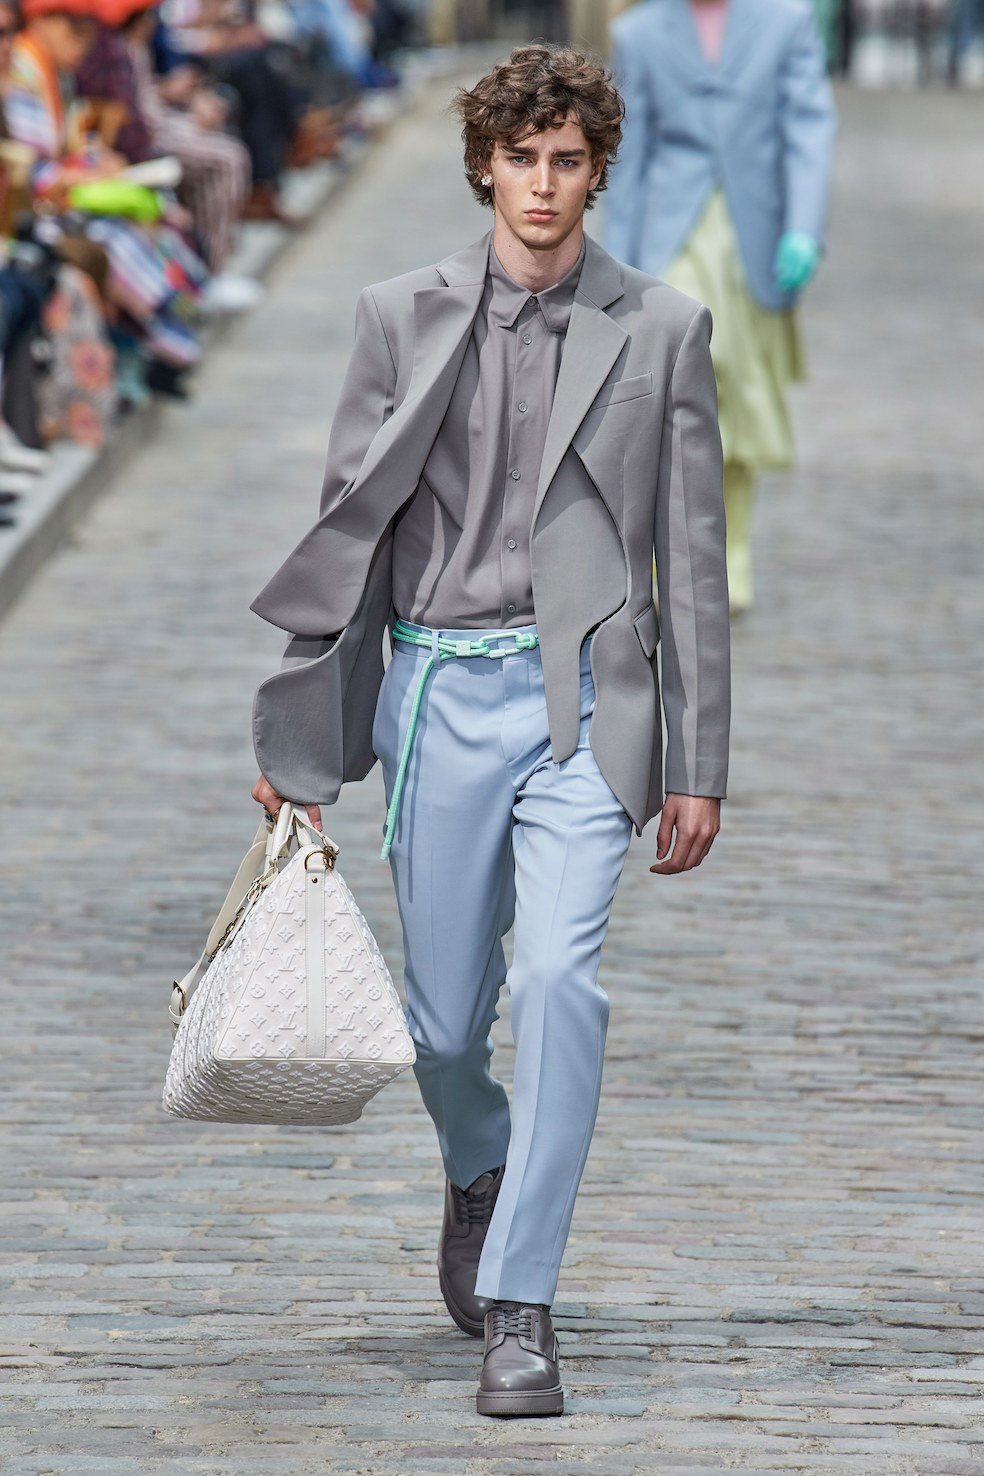 Louis_Vuitton_SS20_Behind_The_Blinds_Magazine__FIO0141.jpg